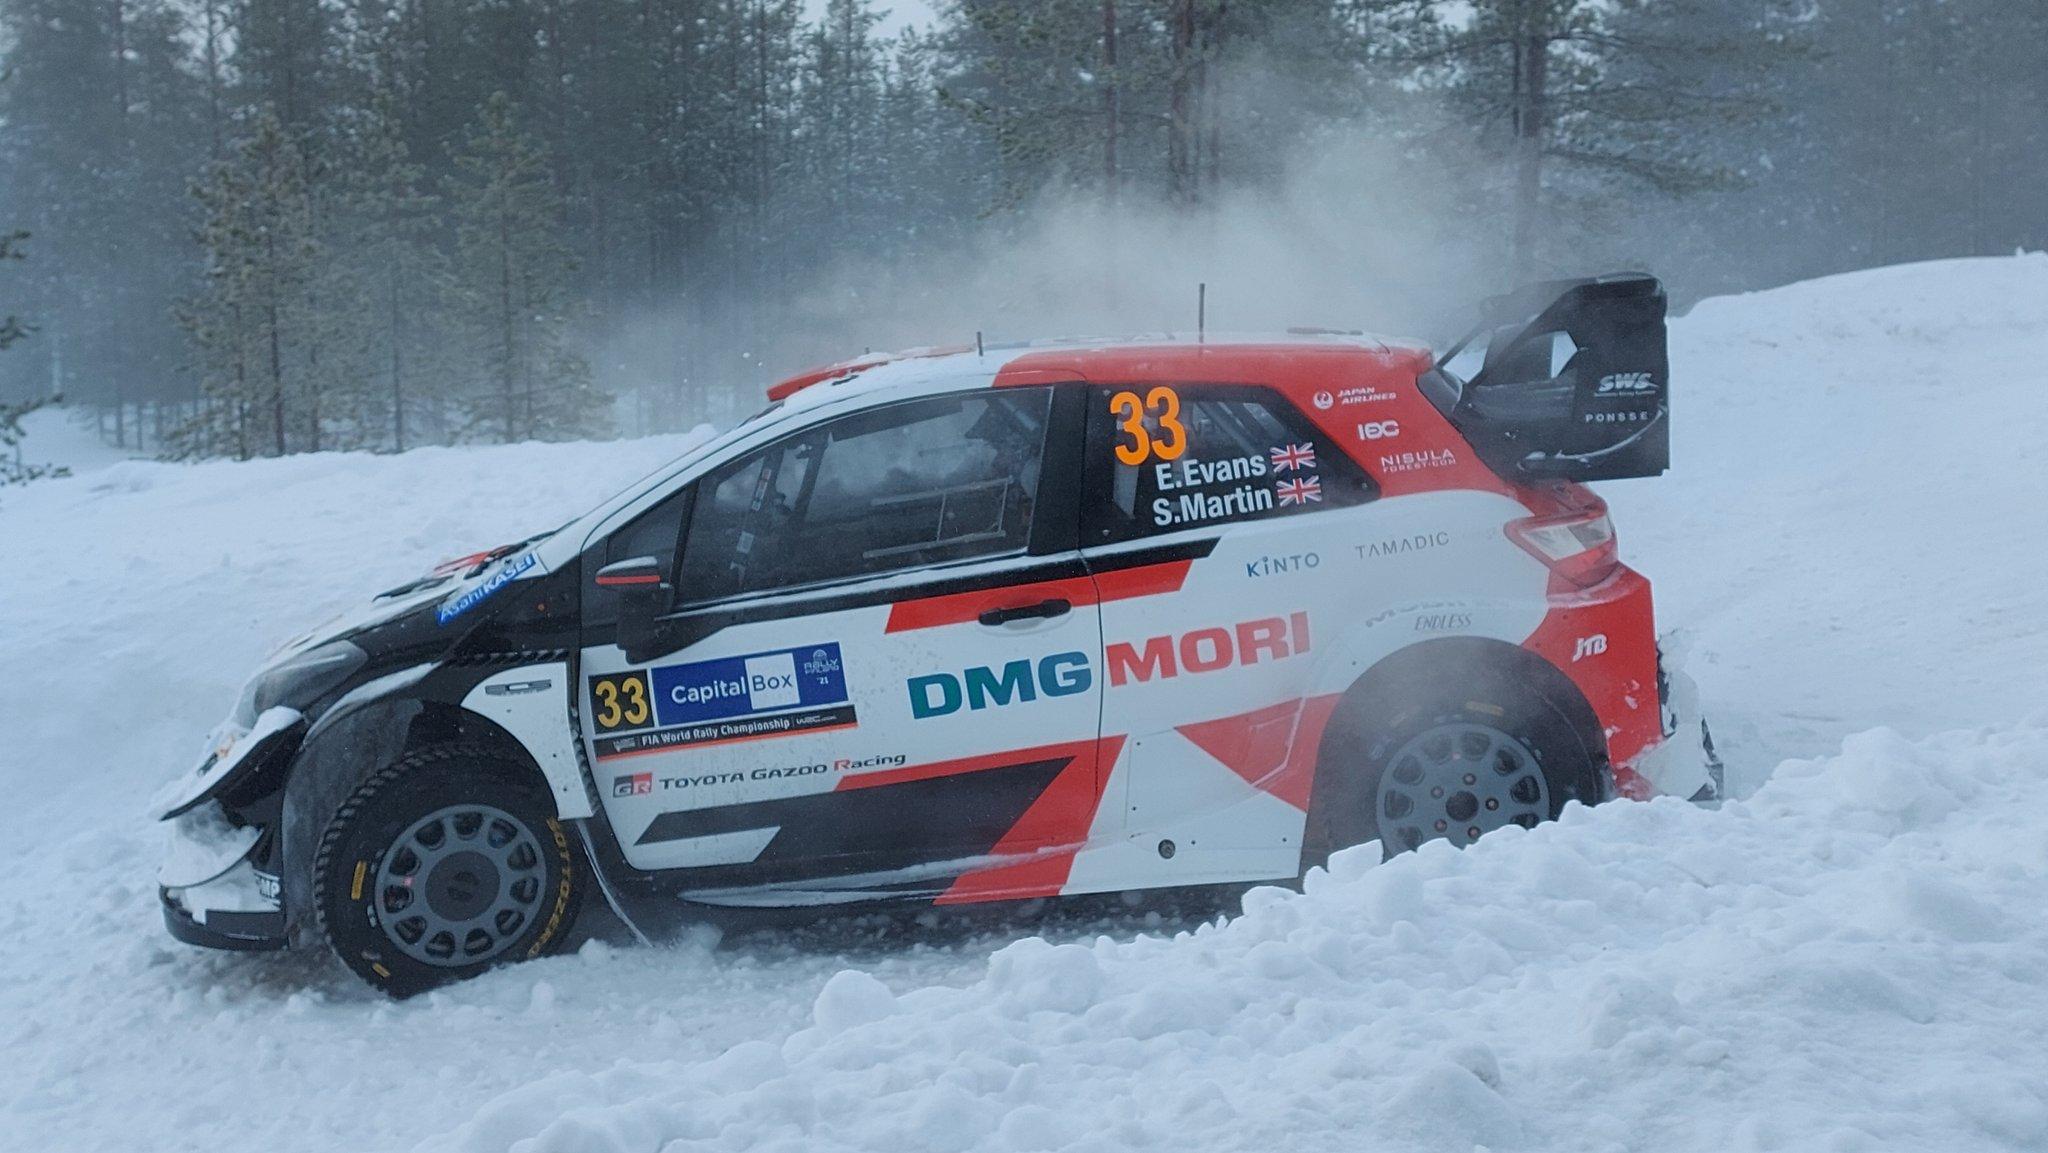 WRC: Arctic Rally Finland - Powered by CapitalBox [26-28 Febrero] - Página 2 EvIqSvlWQAEuuAf?format=jpg&name=large